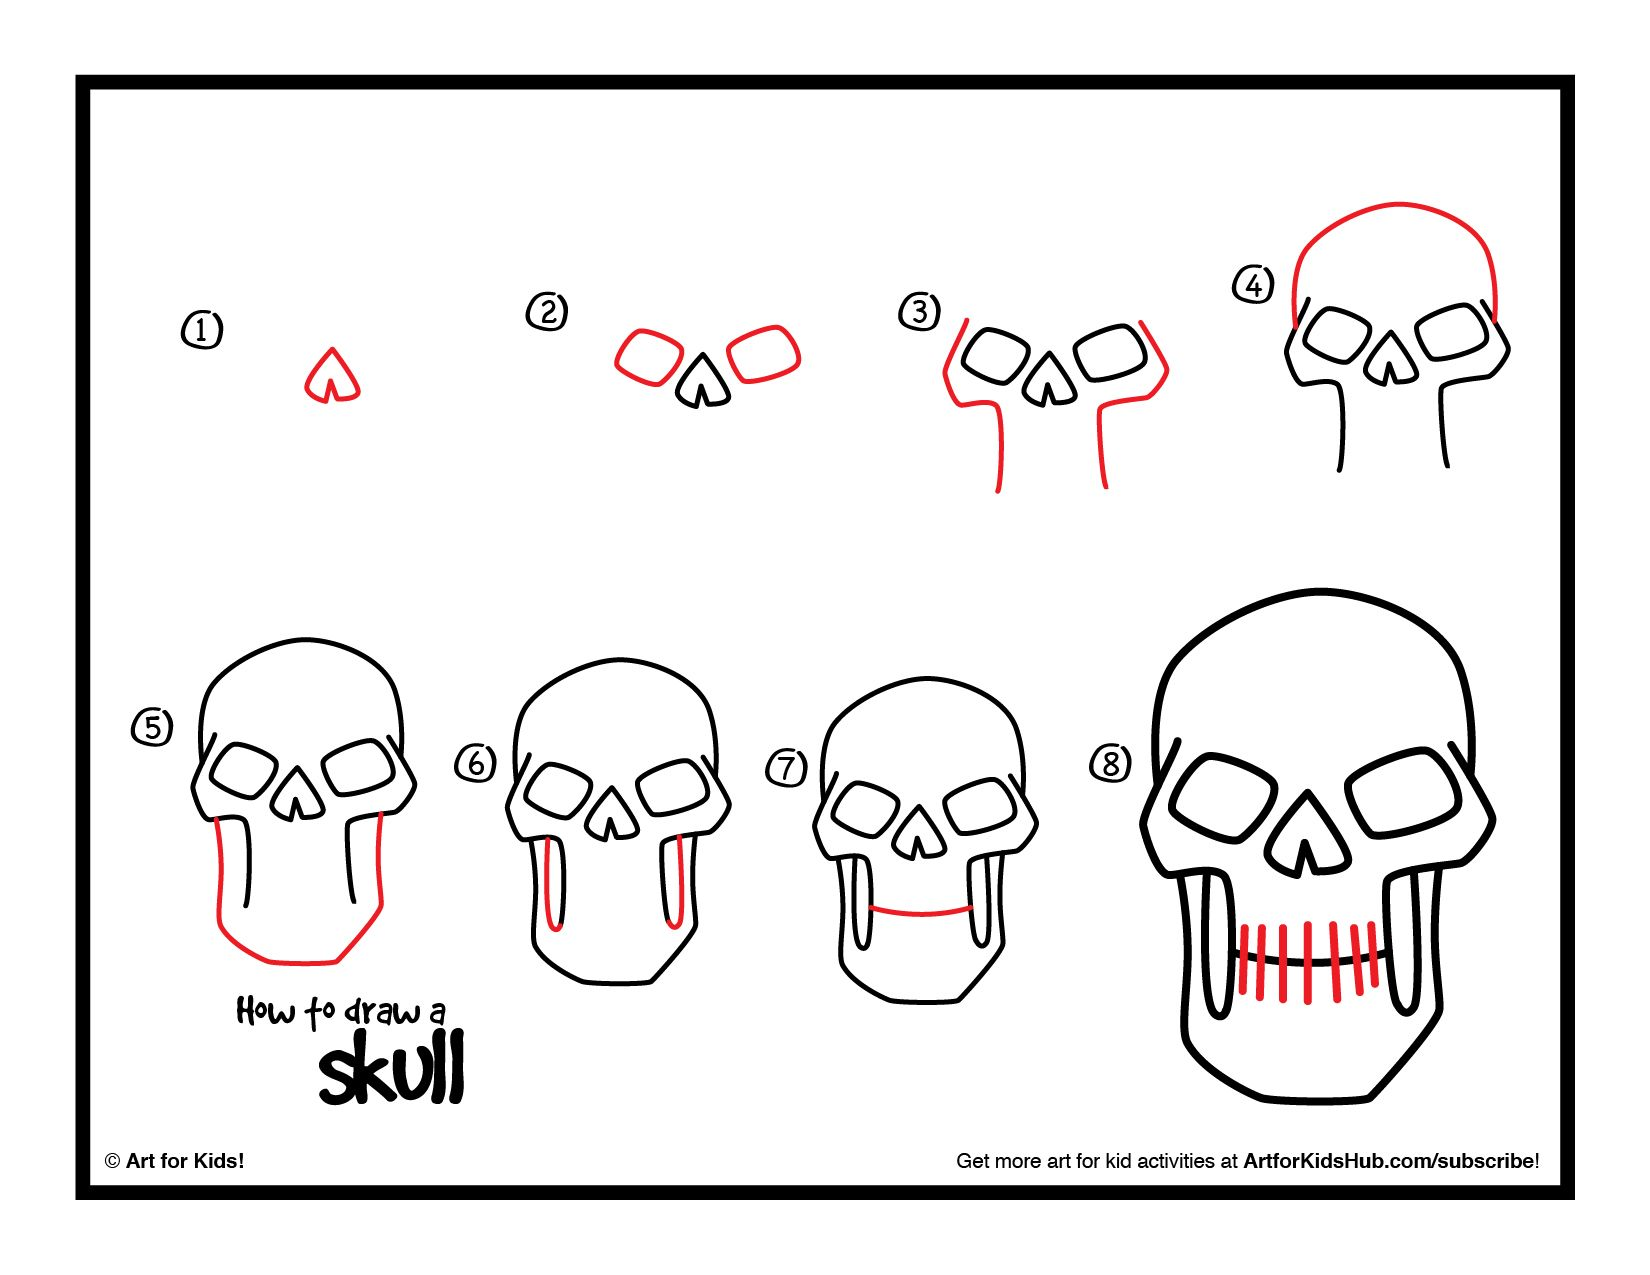 How To Draw A Skull Art For Kids Hub Easy Halloween Drawings Halloween Drawings Easy Skull Drawings